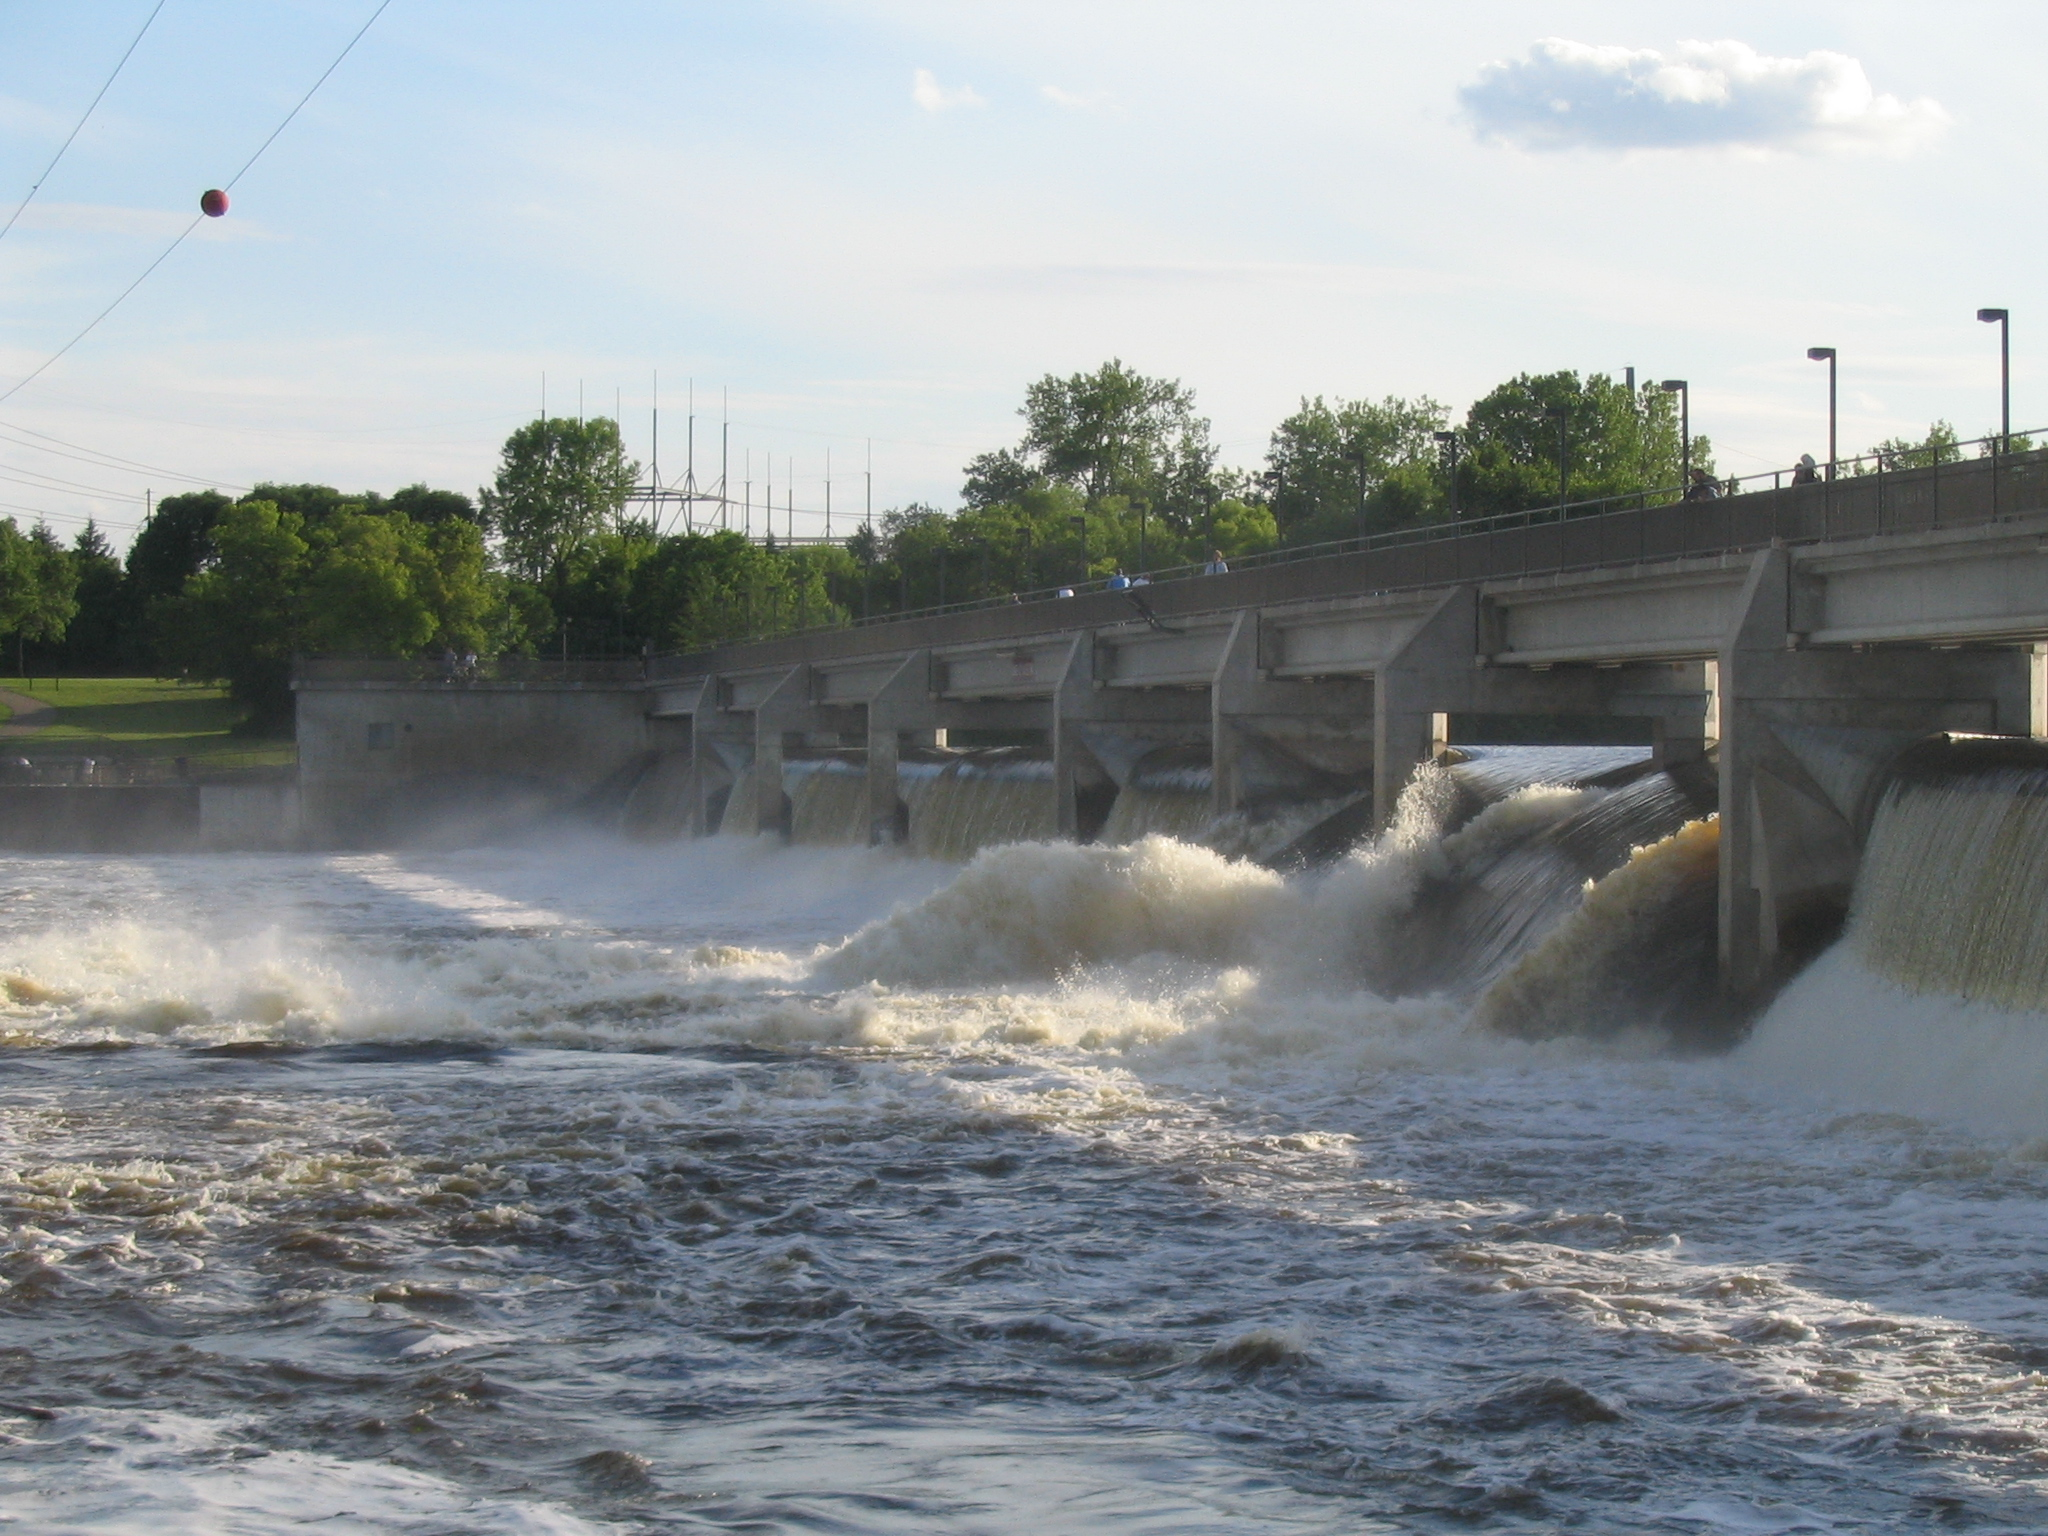 File:Coon Rapids River Dam  Coon Rapids, Minnesota.jpg  Wikipedia